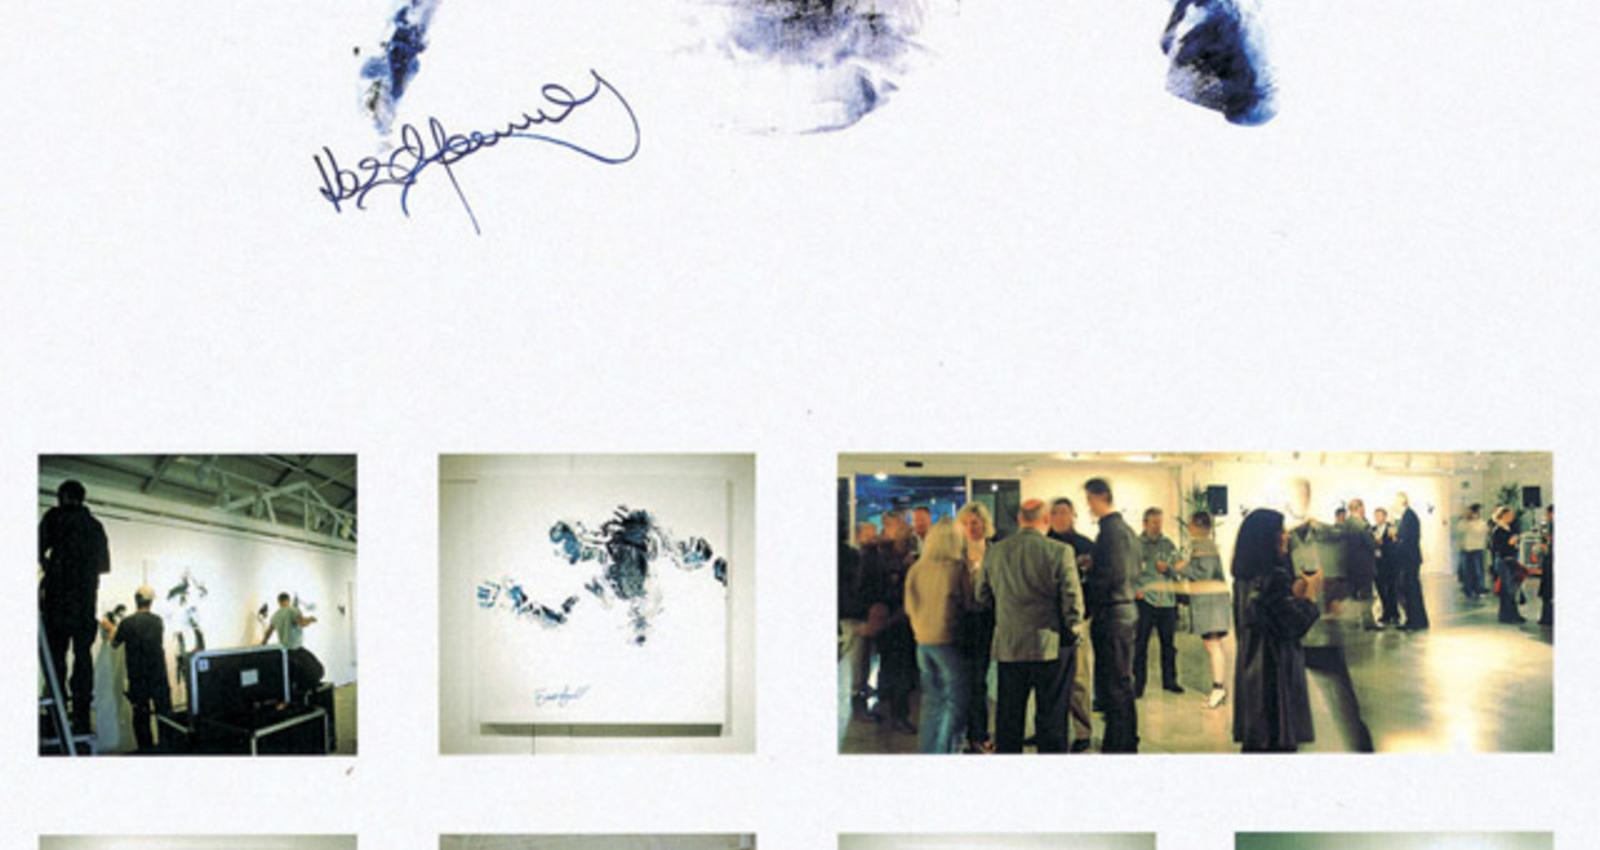 Self Portraits, Art Exhibition, Print, London Outdoor